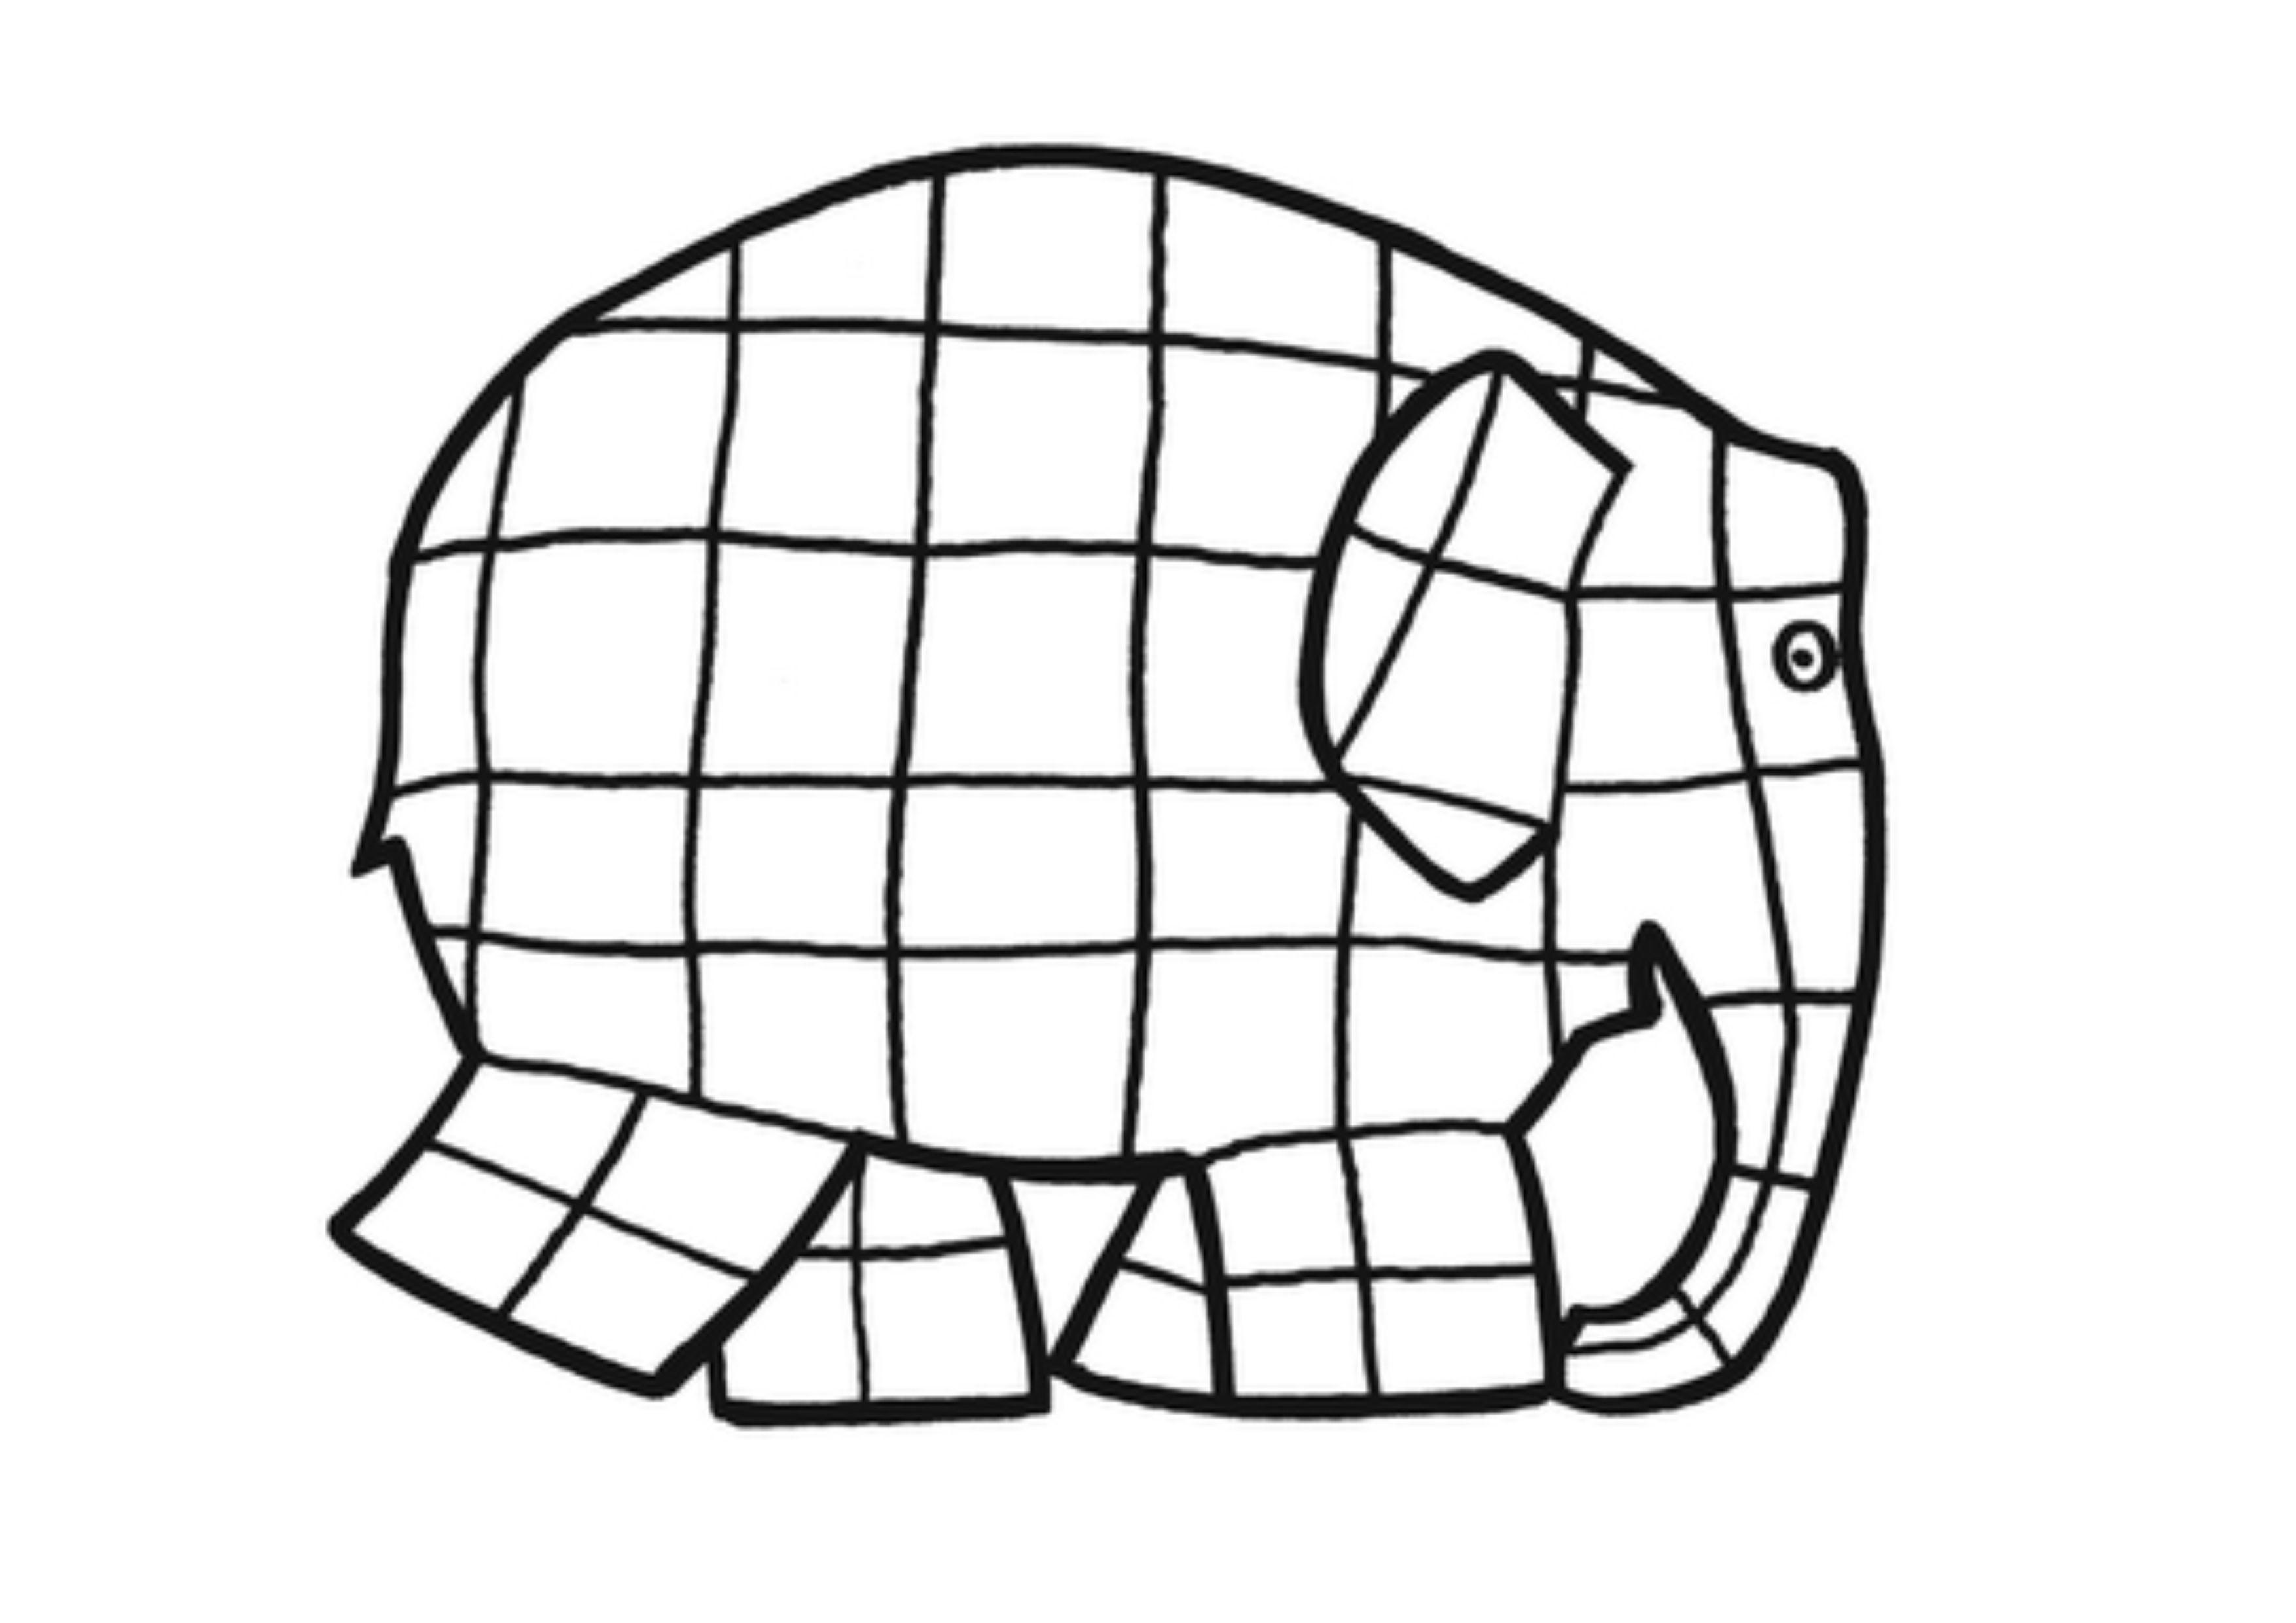 Elmer Elephant Coloring Page Elmer The Elephants Elephant Coloring Page Elmer